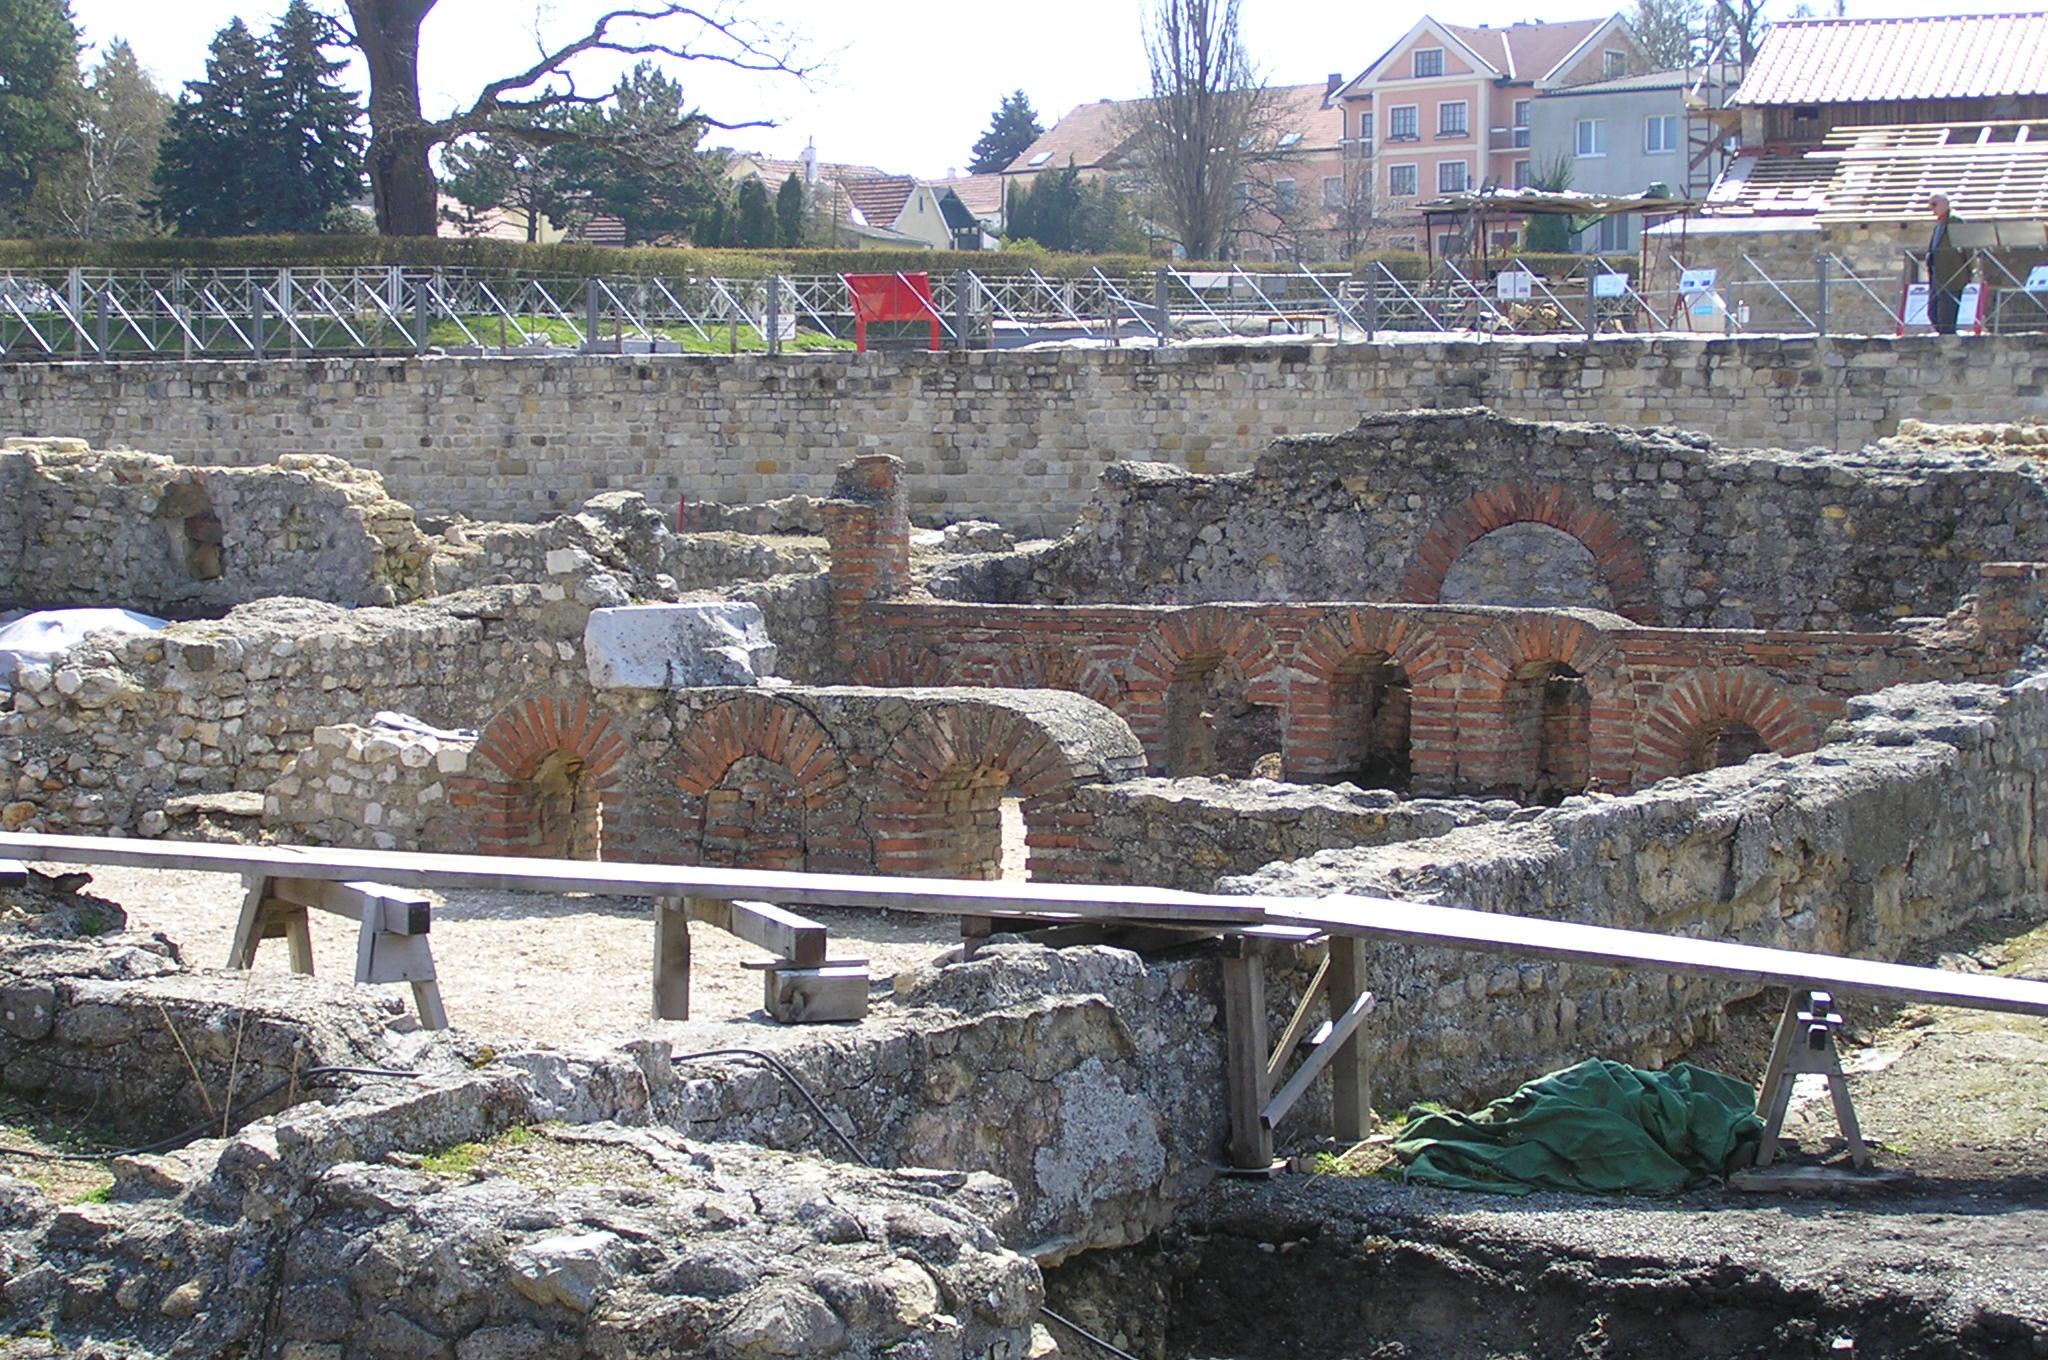 File:Carnuntum Public Bath.jpg - Wikimedia Commons